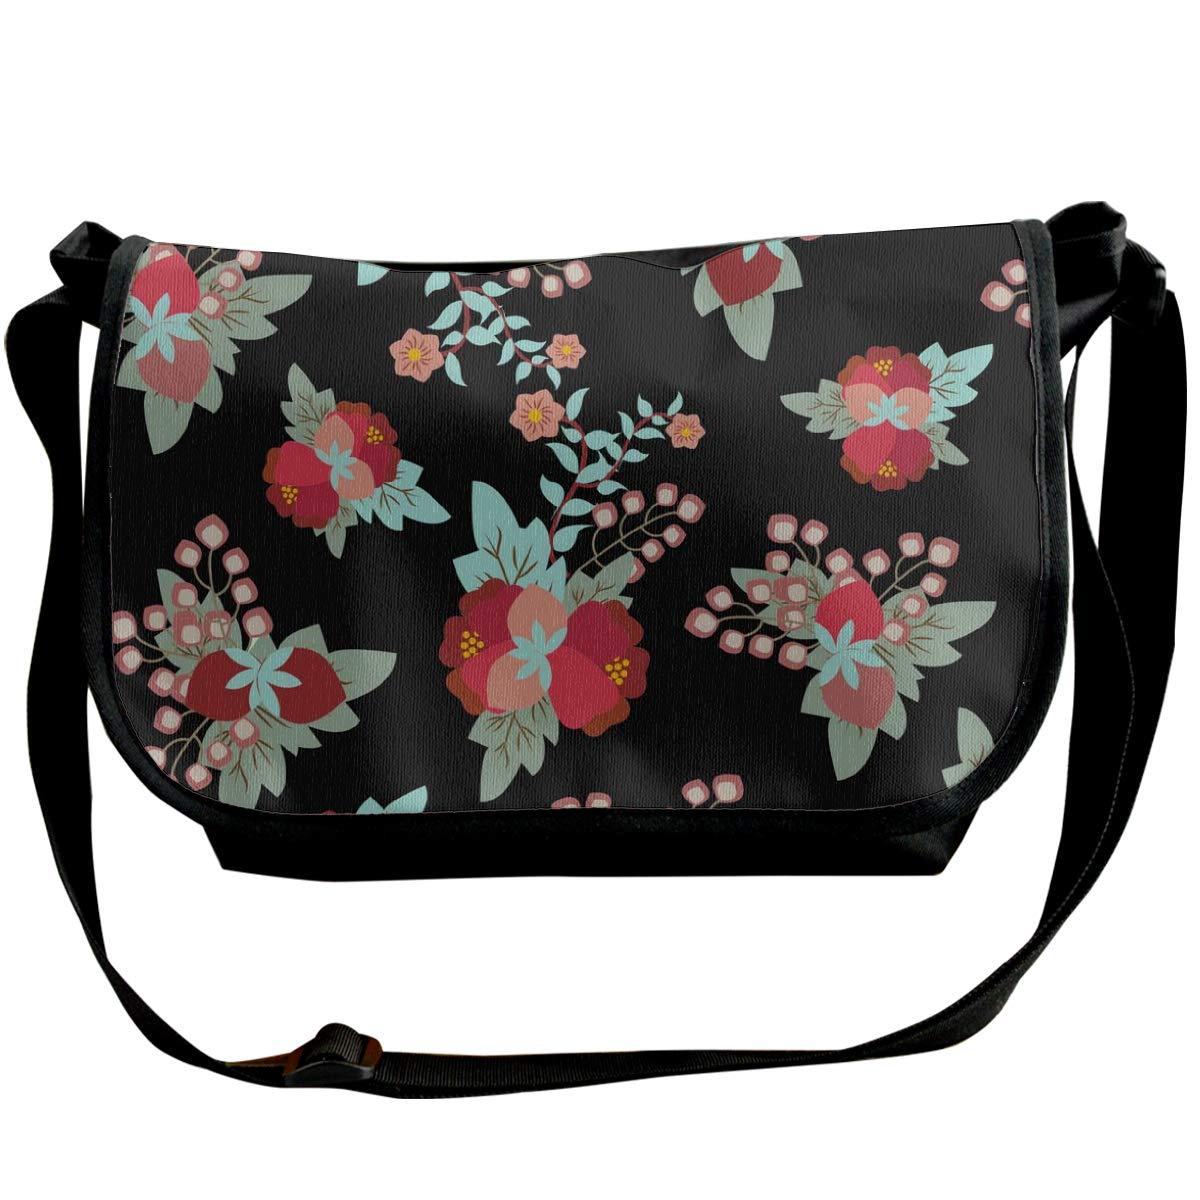 Taslilye Floral Vintage Pattern Romantic Vector Image Personalized Wide Crossbody Shoulder Bag For Men And Women For Daily Work Or Travel